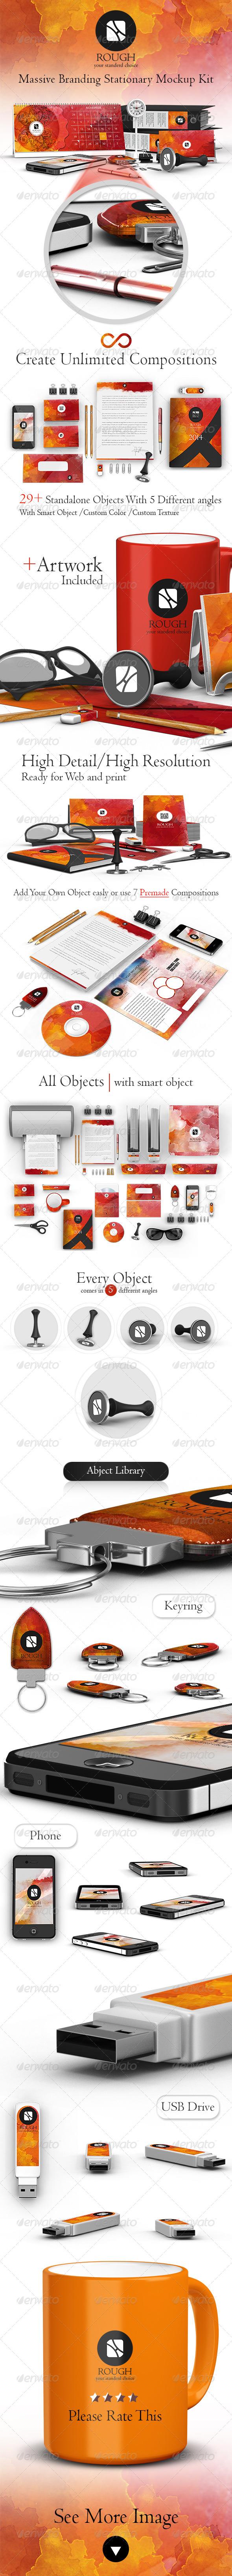 GraphicRiver Rough Massive Branding Stationary Kit 6122007